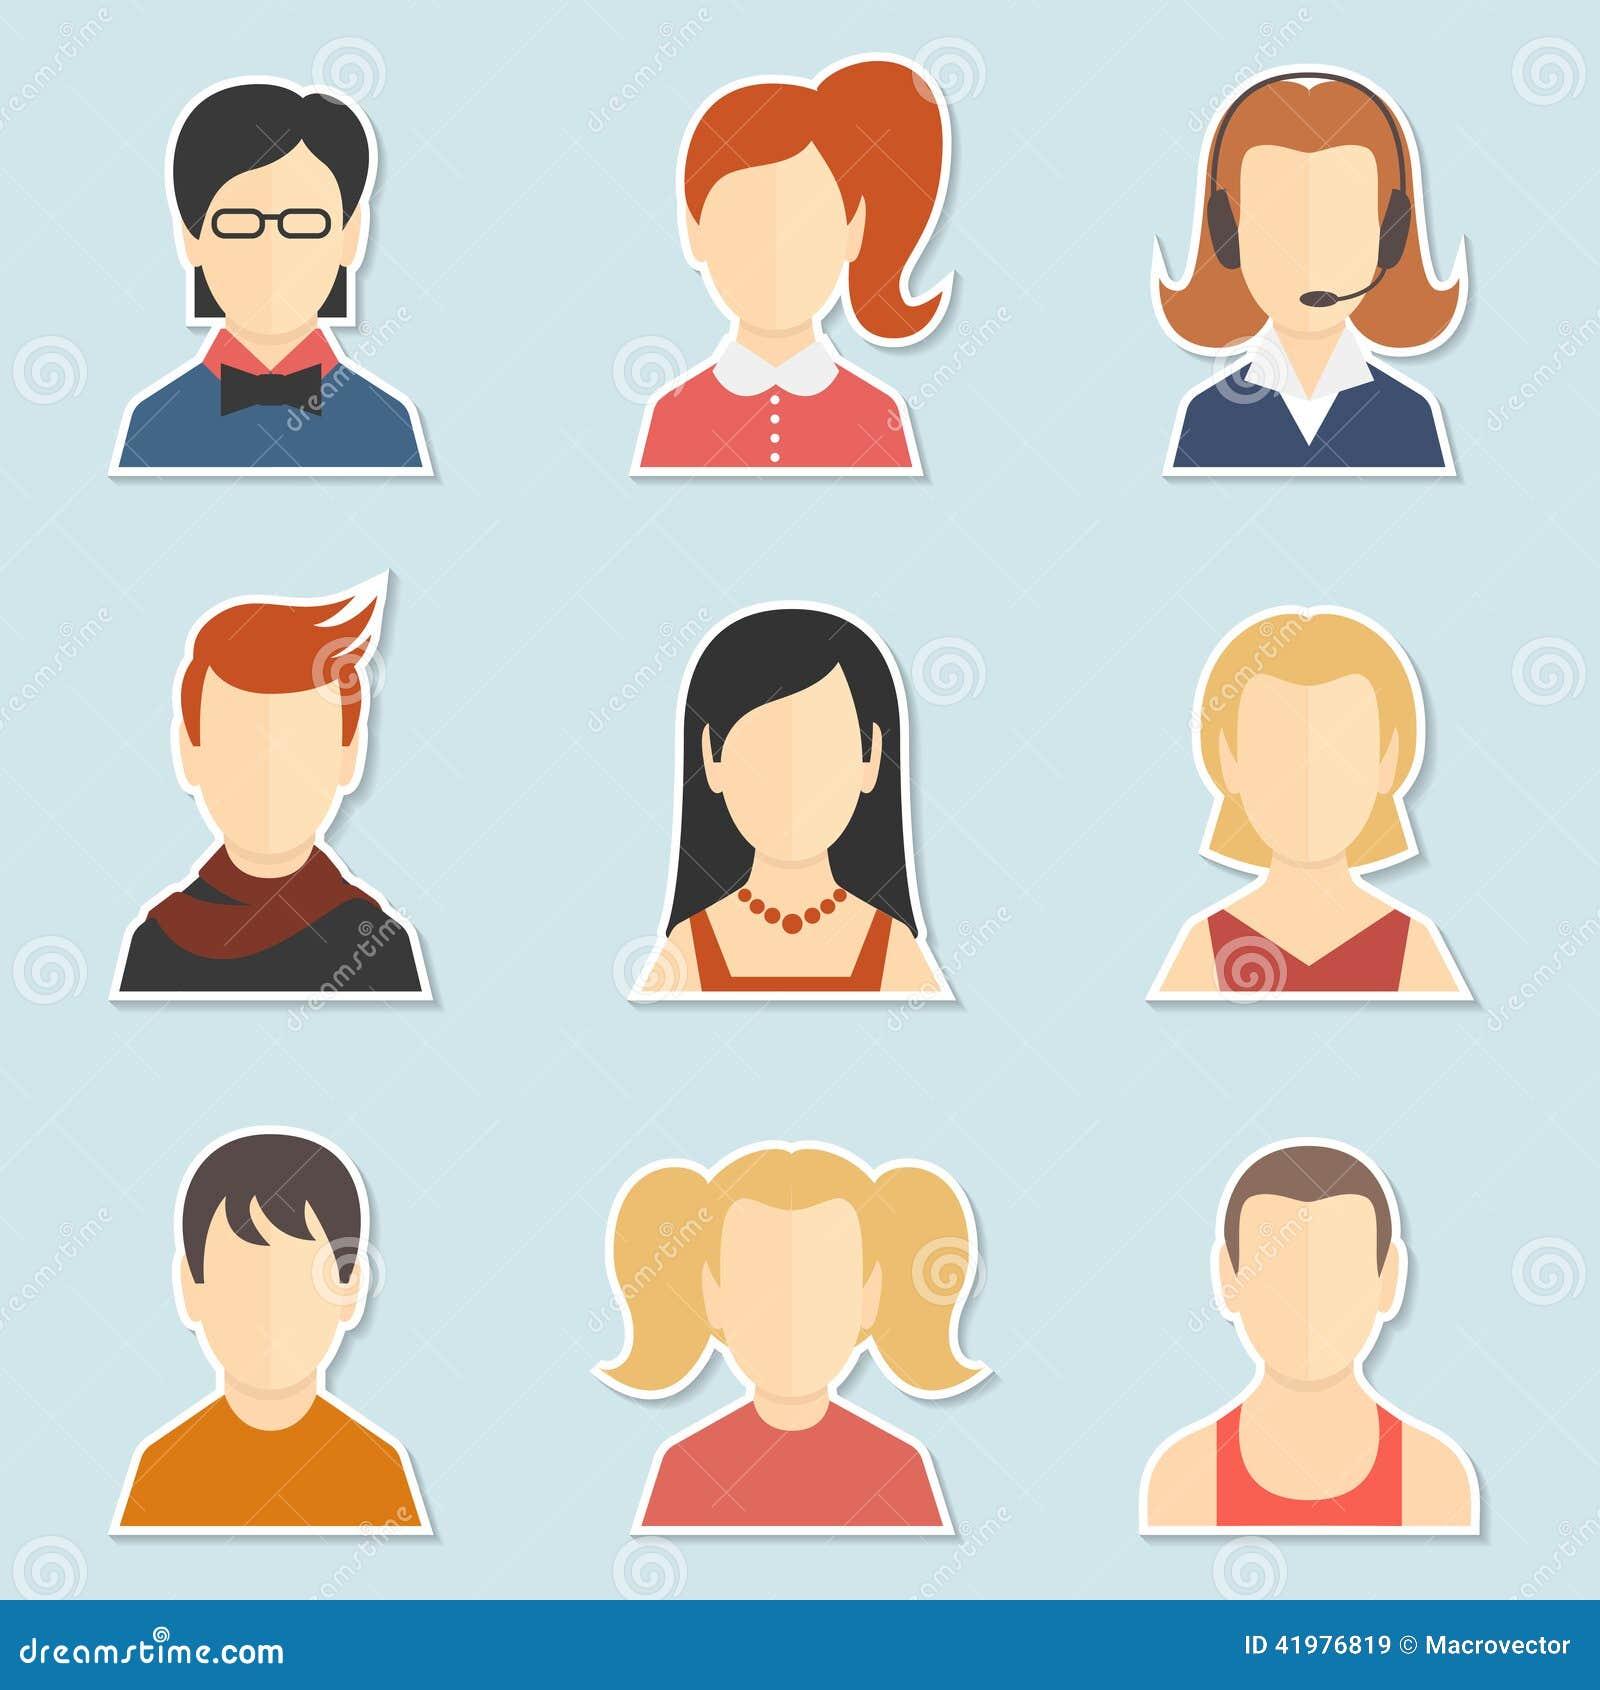 Анимационные аватарки для аськи ...: pictures11.ru/animacionnye-avatarki-dlya-aski.html